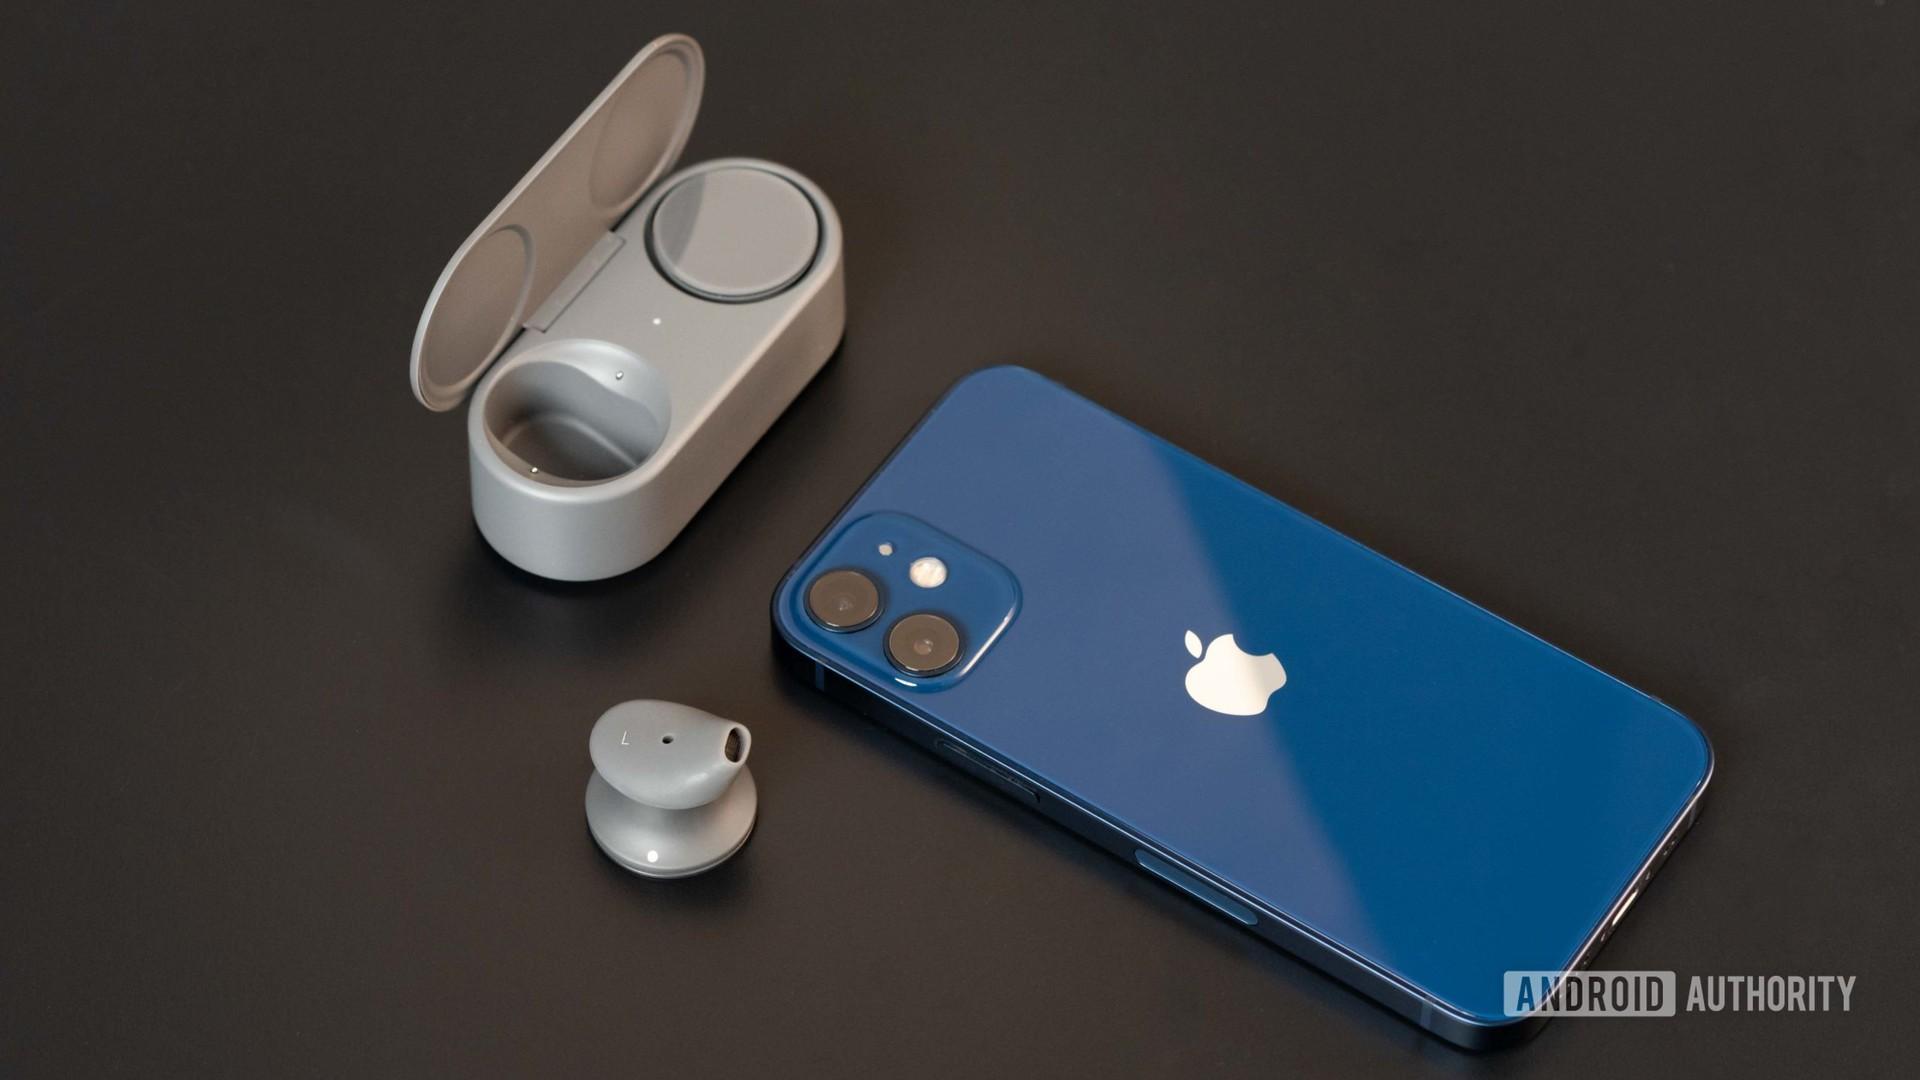 Microsoft Surface Earbuds true wireless earbuds open case iphone 12 mini